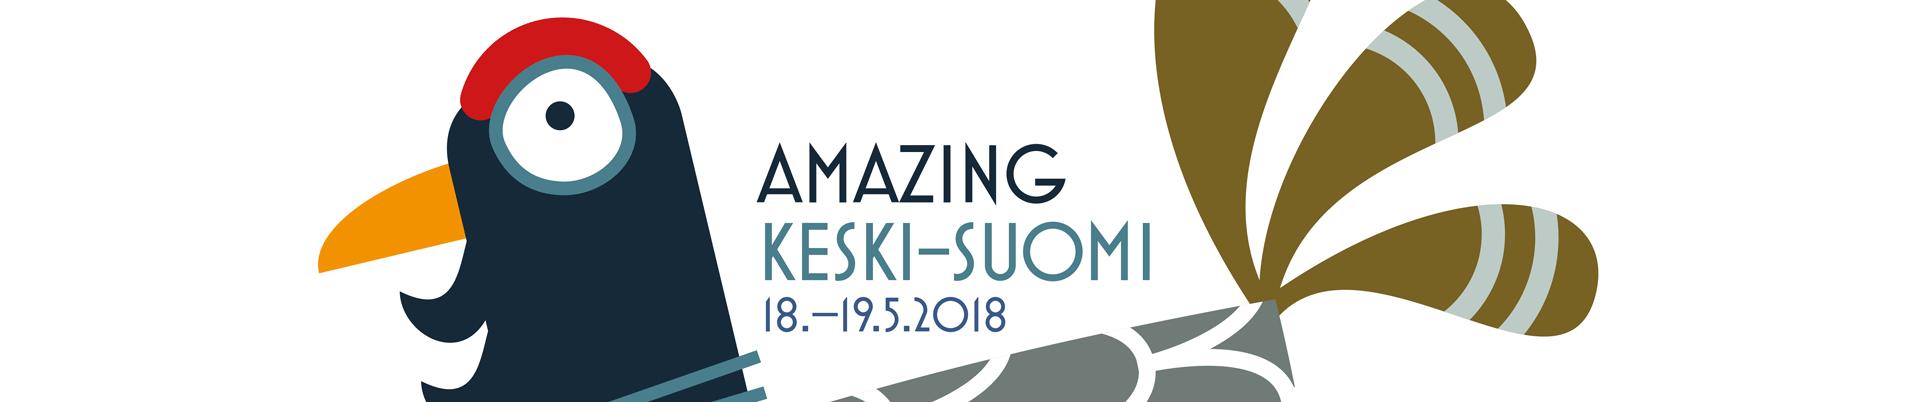 Amazing Keski-Suomi 18.-19.5.2018 - Aito Maaseutu